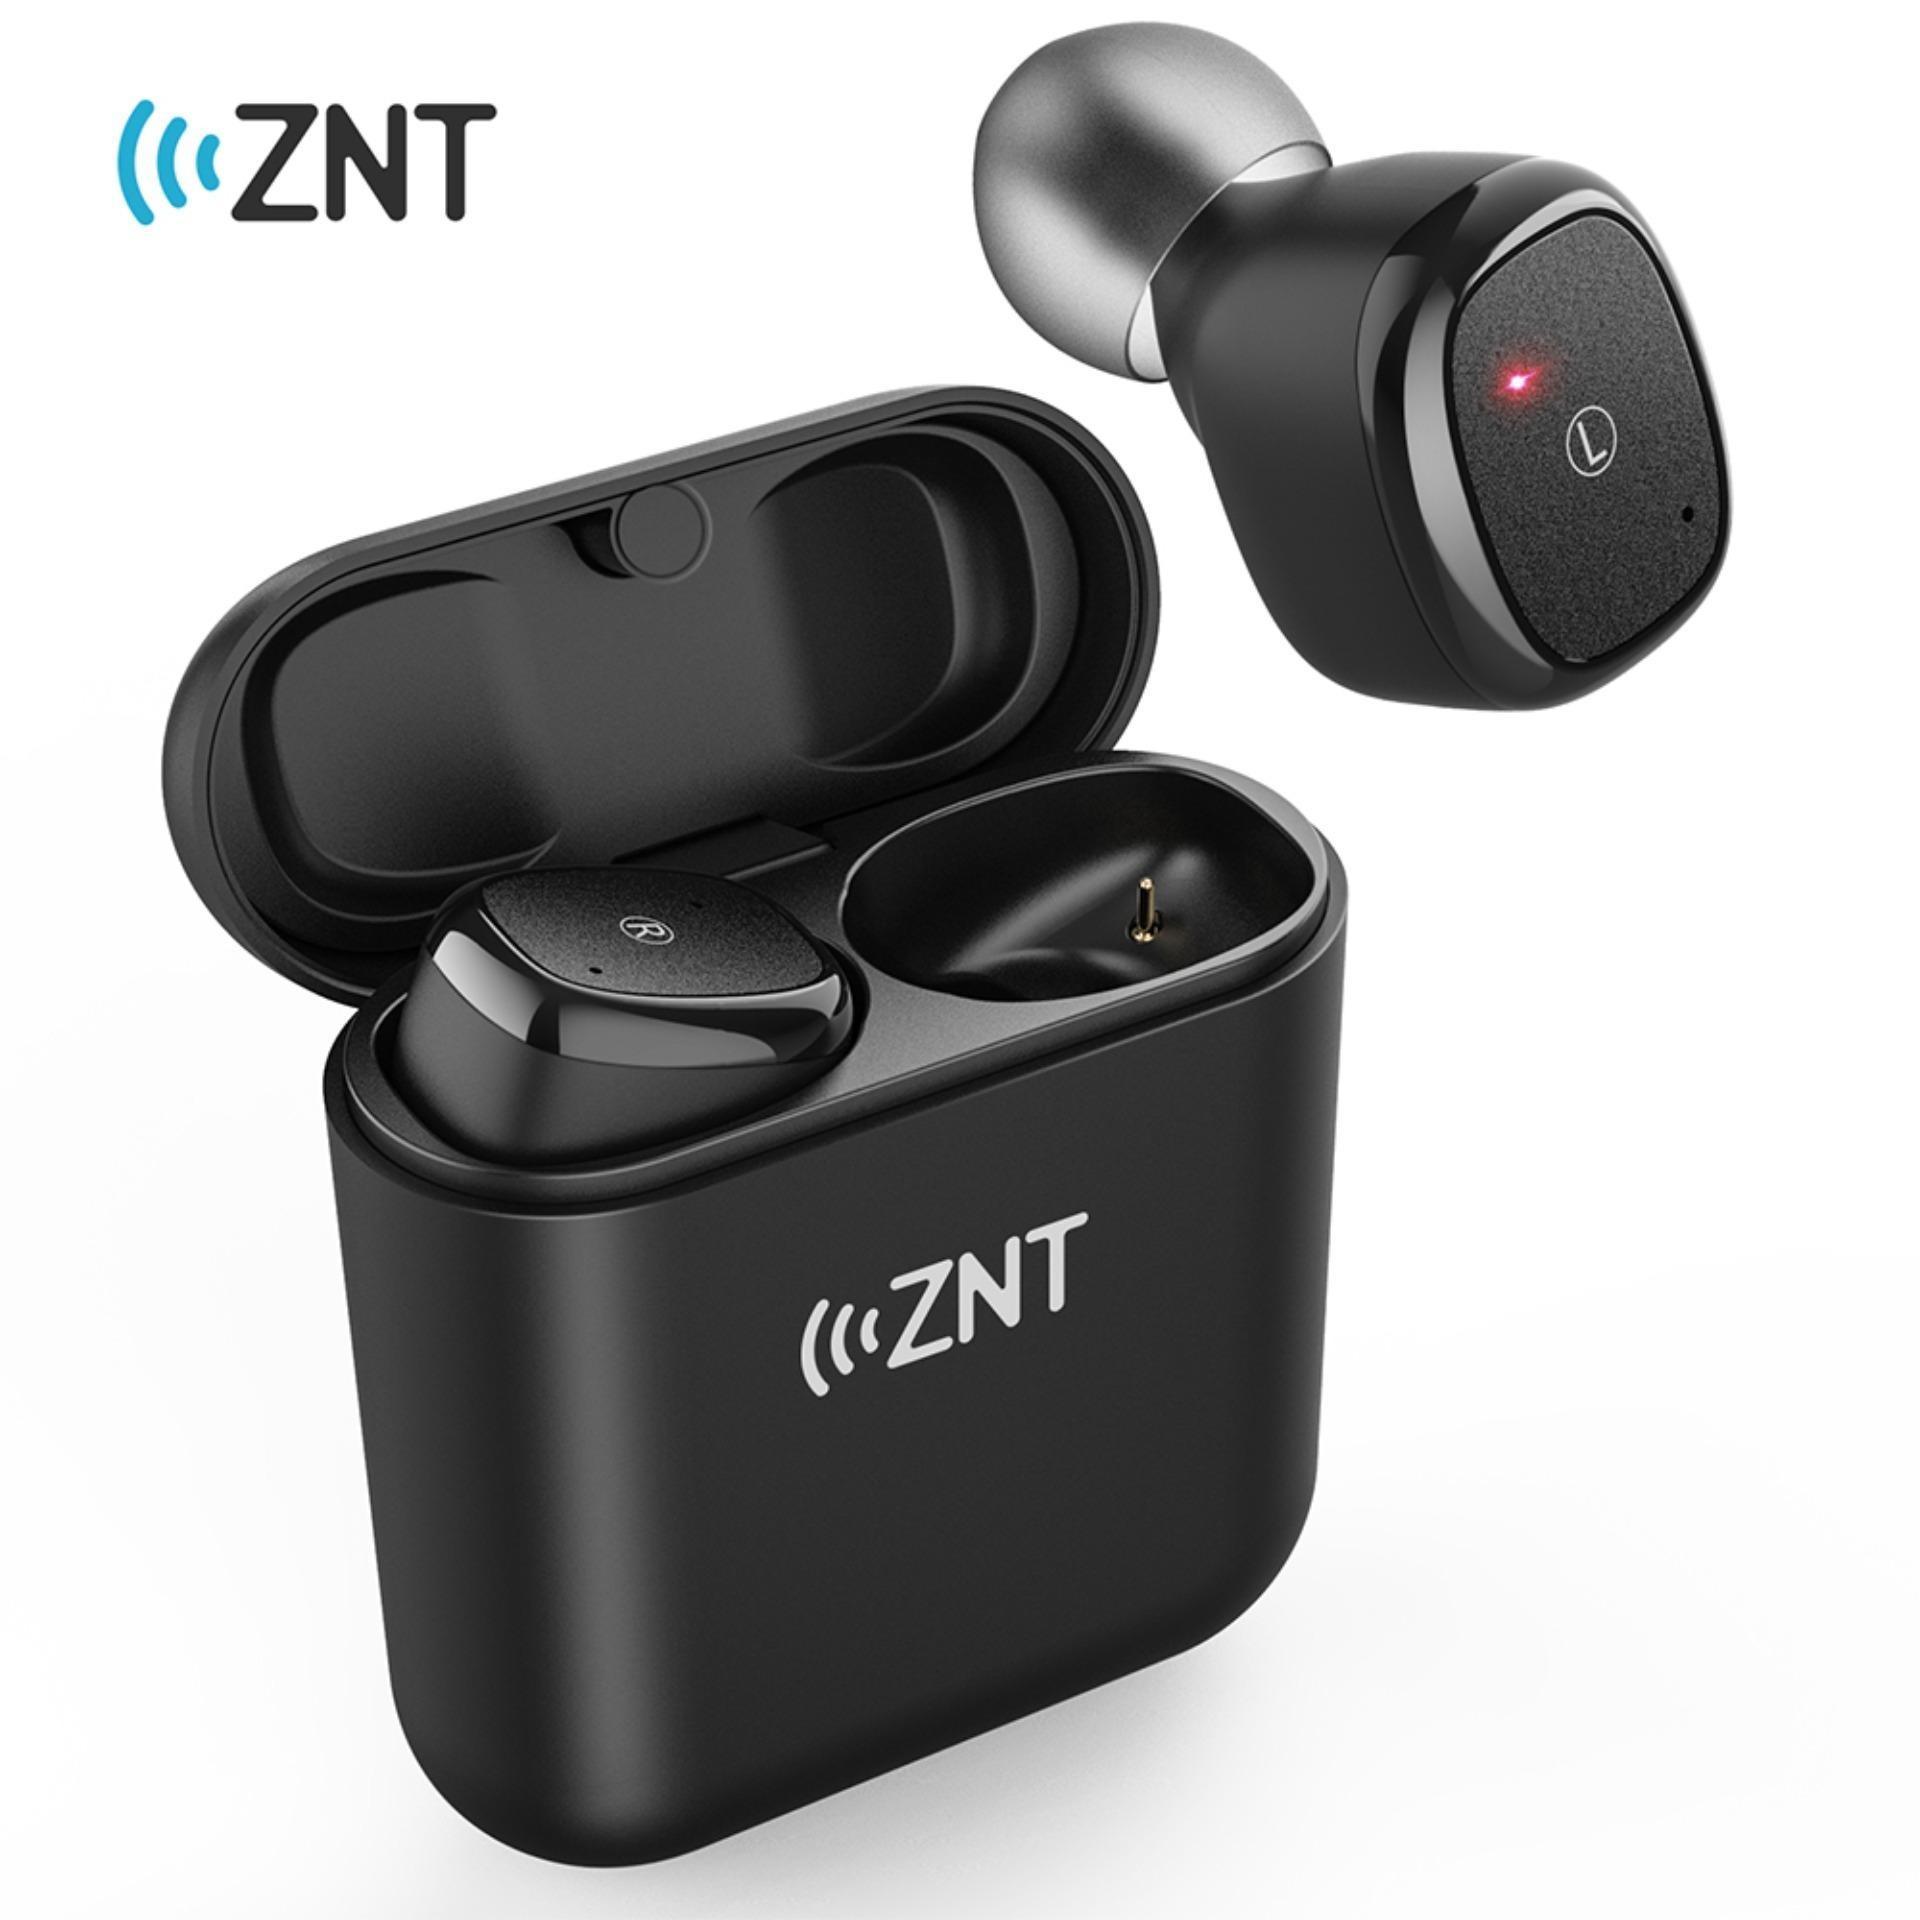 8d4c0f23daa ZNT D06-L True Wireless Earbuds with Bluetooth 5.0 and Hi-Fi Sound Quality